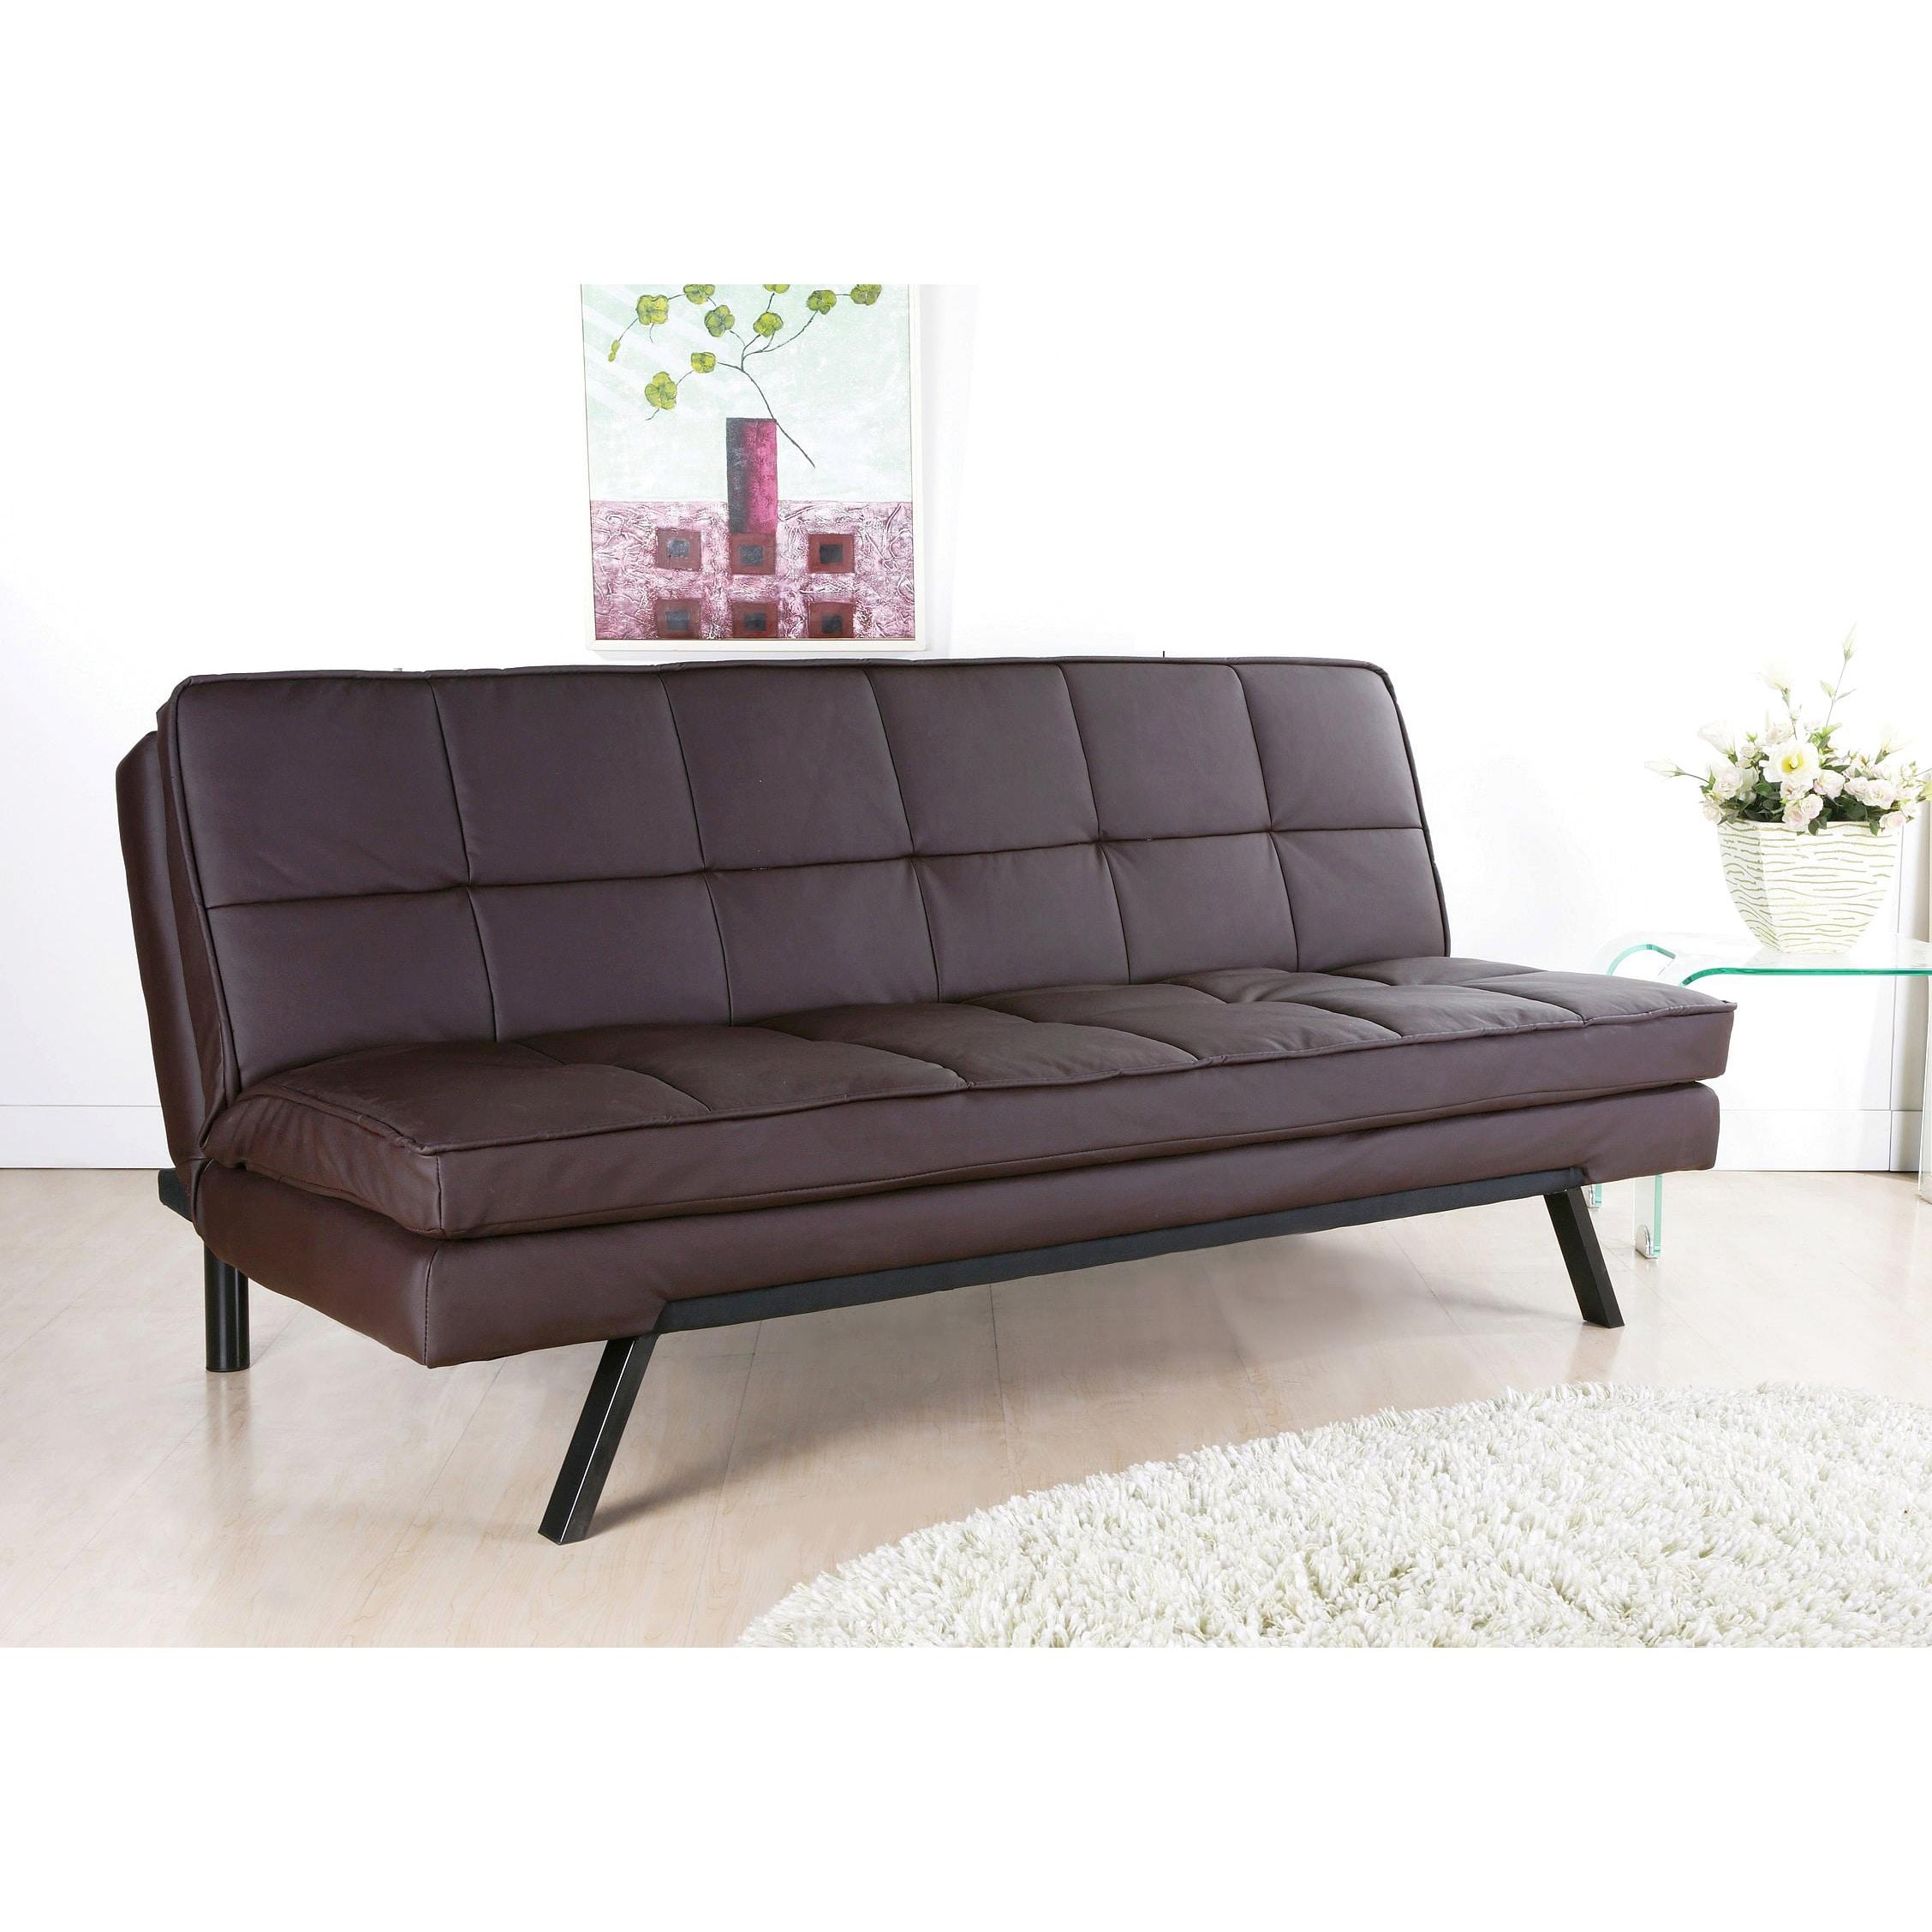 Abbyson Newport Faux Leather Futon Sleeper Sofa (Brown), ...